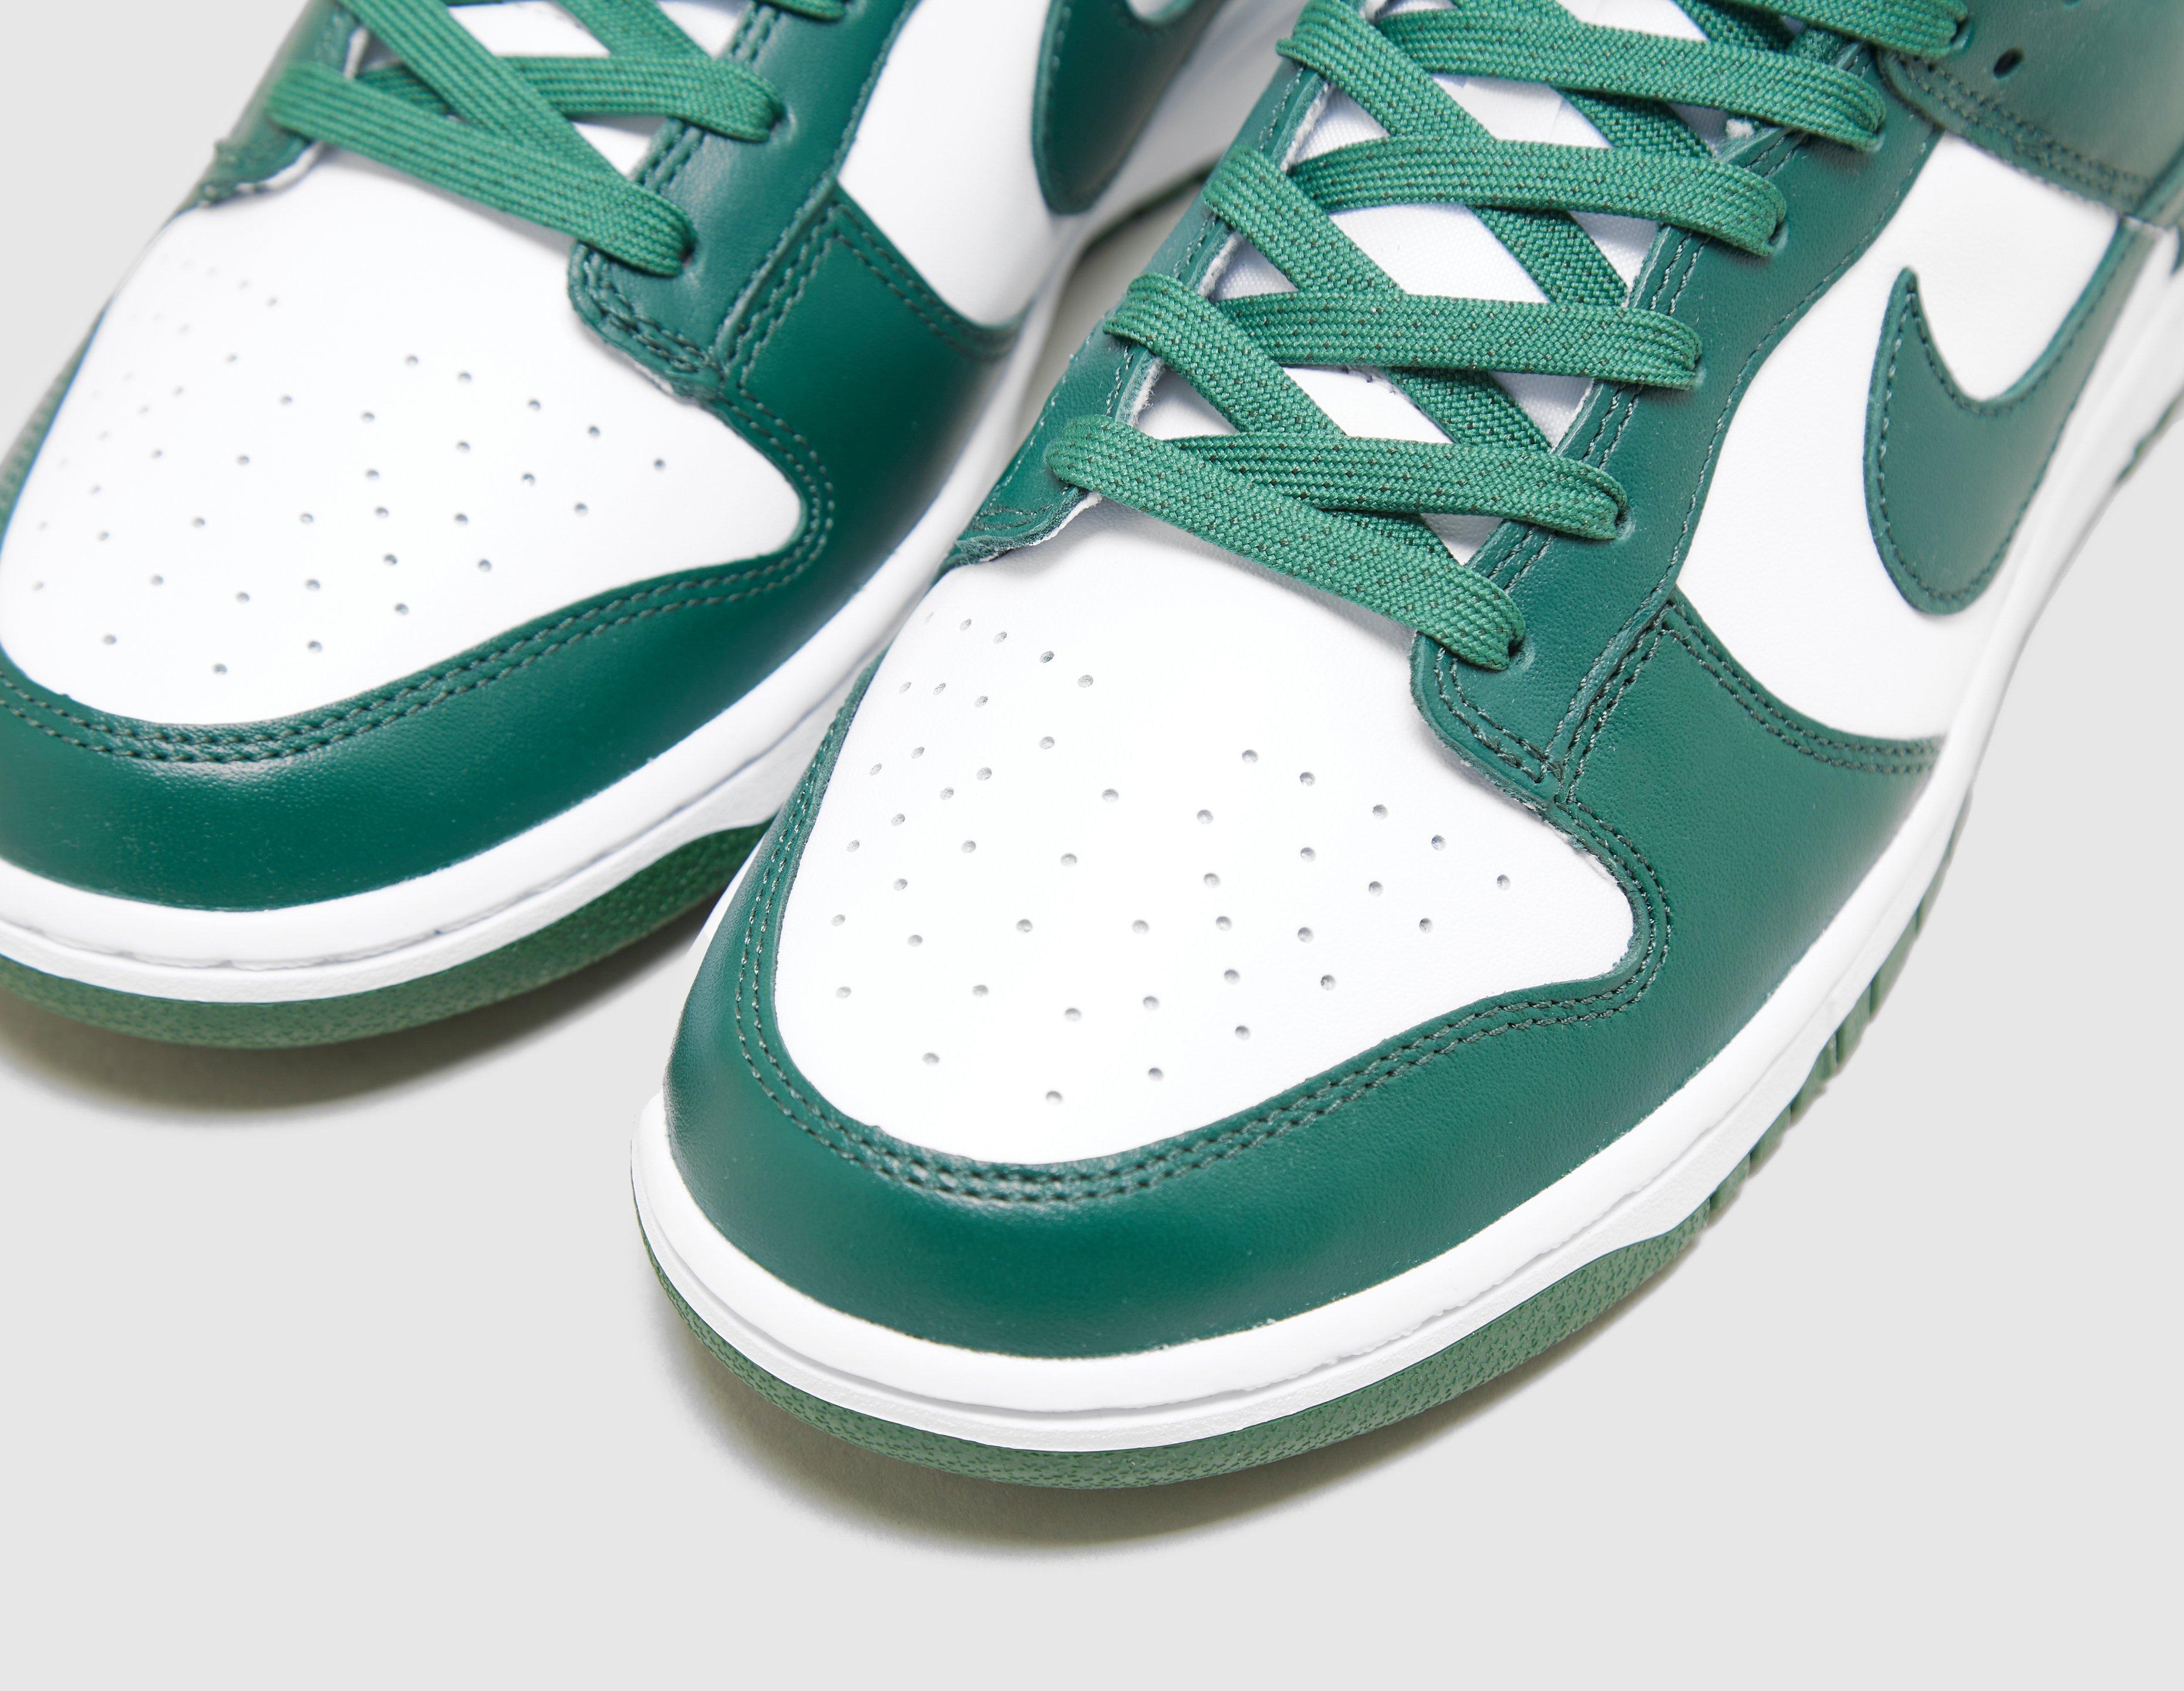 Nike Dunk Low 'Michigan State' 2021 Toebox DD1391-101